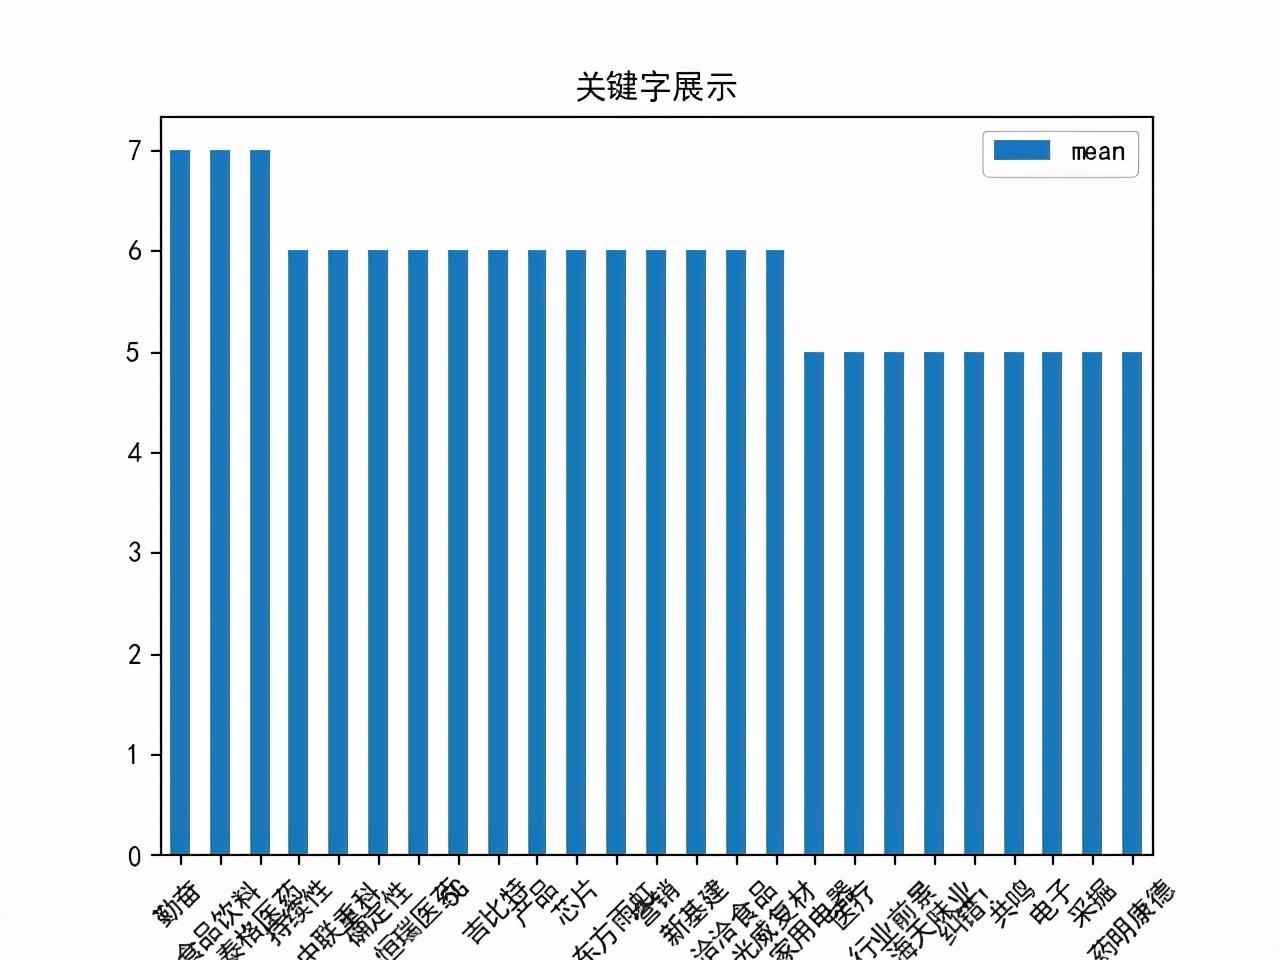 Python爬虫数据分析篇:2021年接下来哪些股票会大涨?